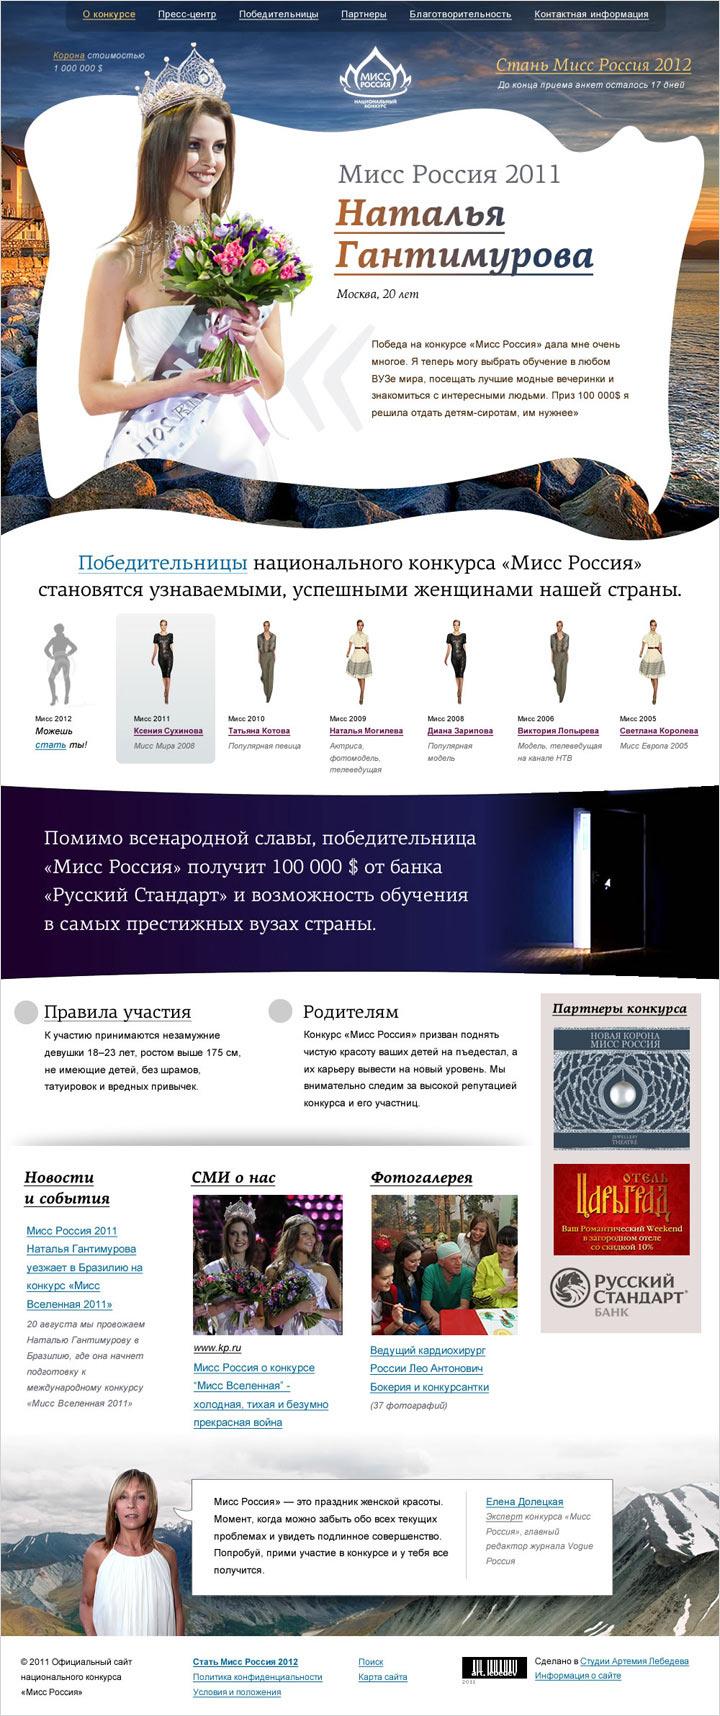 Государственный сайт конкурс